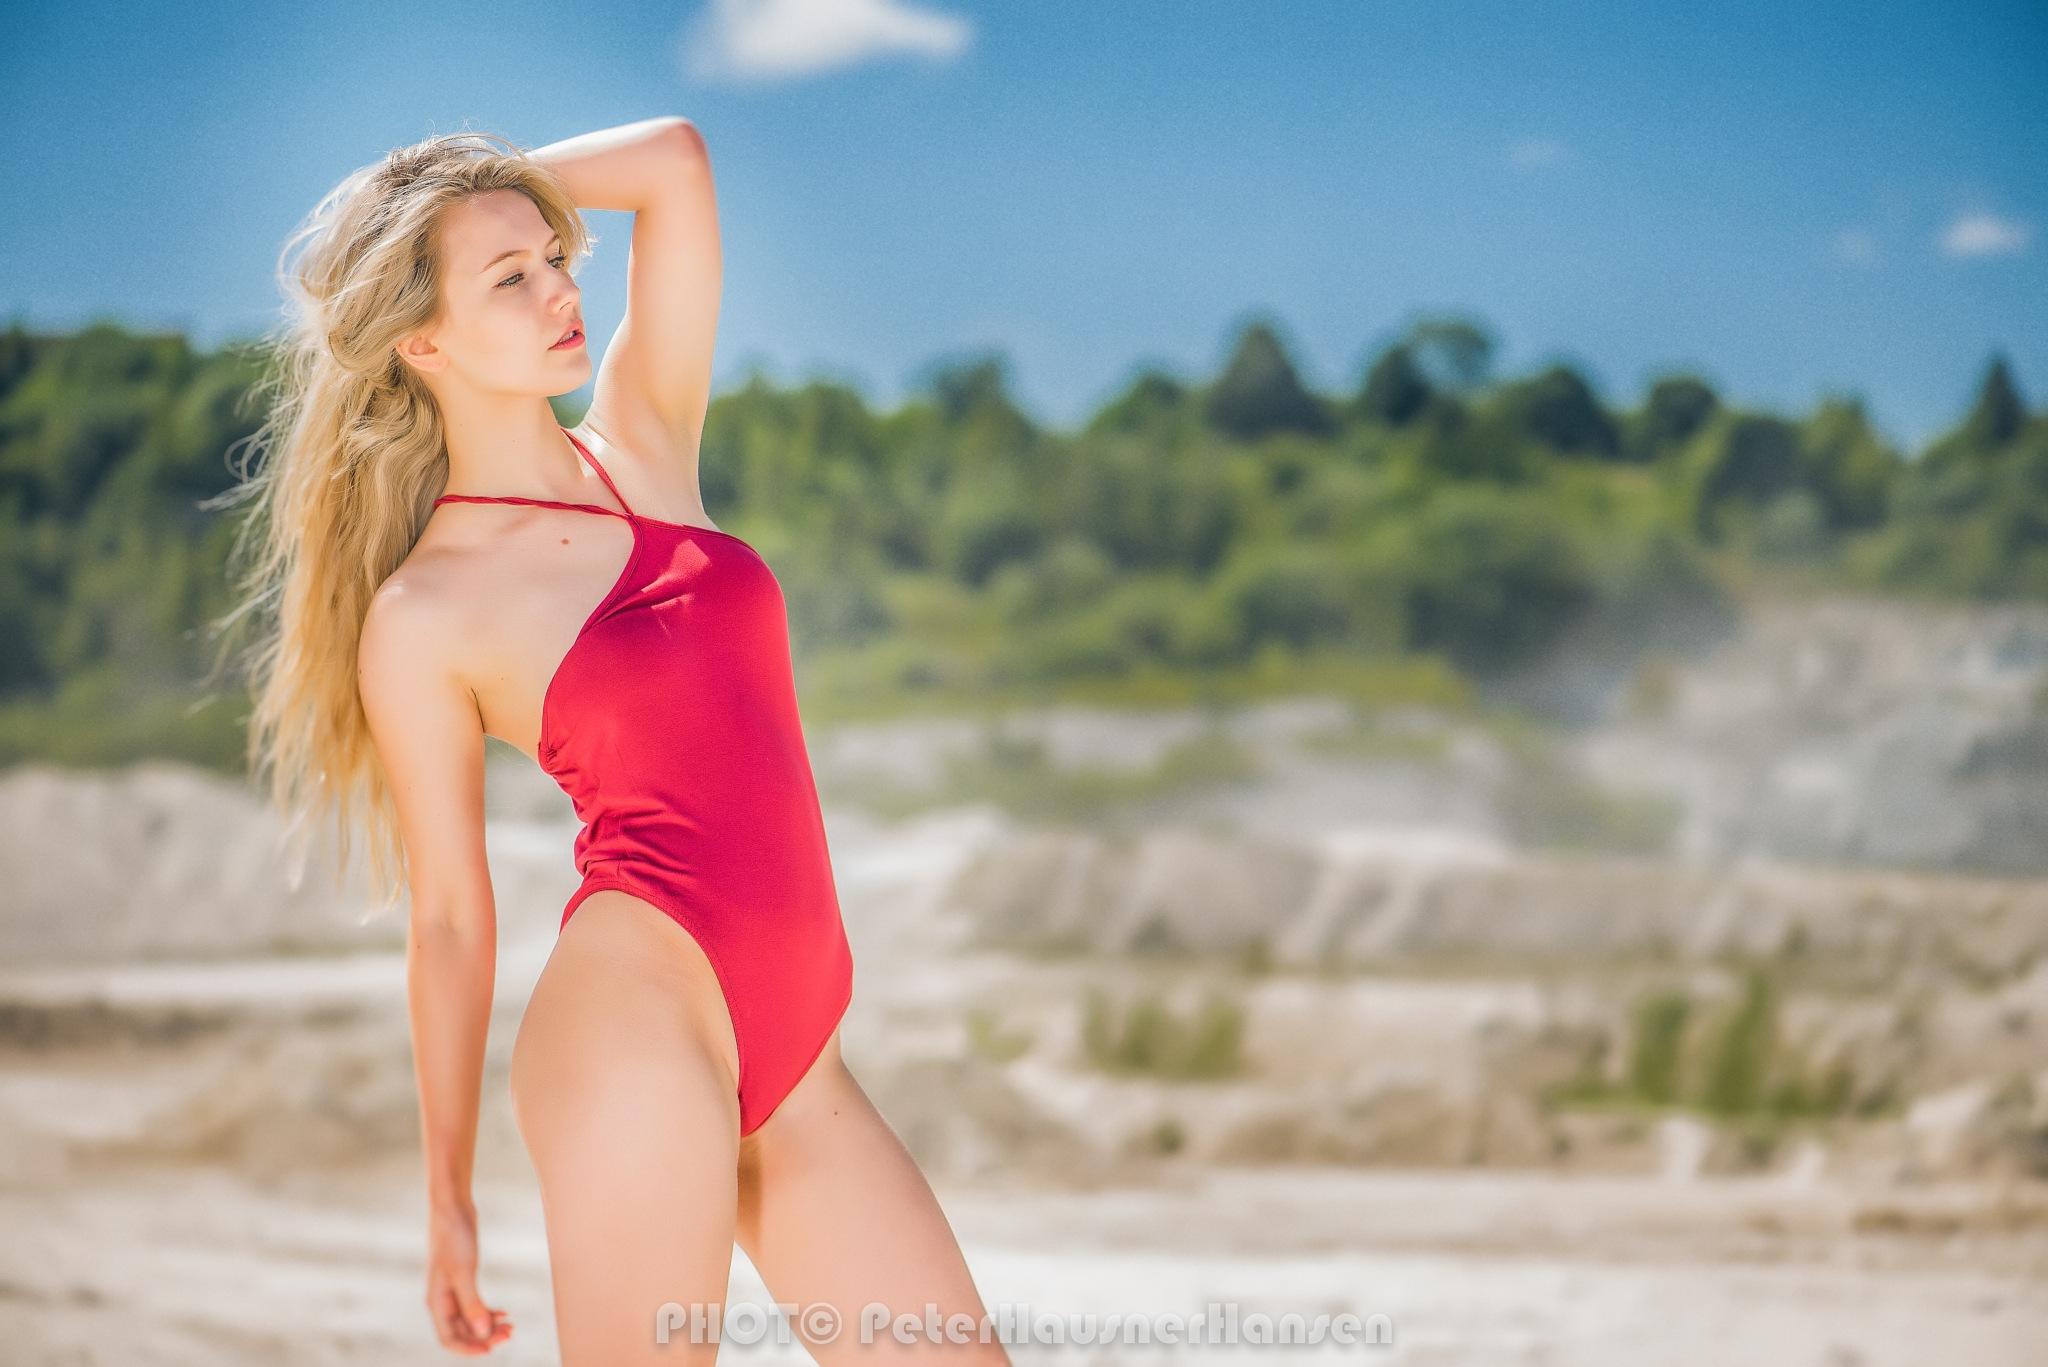 Emilie enjoy the summersun.. by PHOTOPHH.1